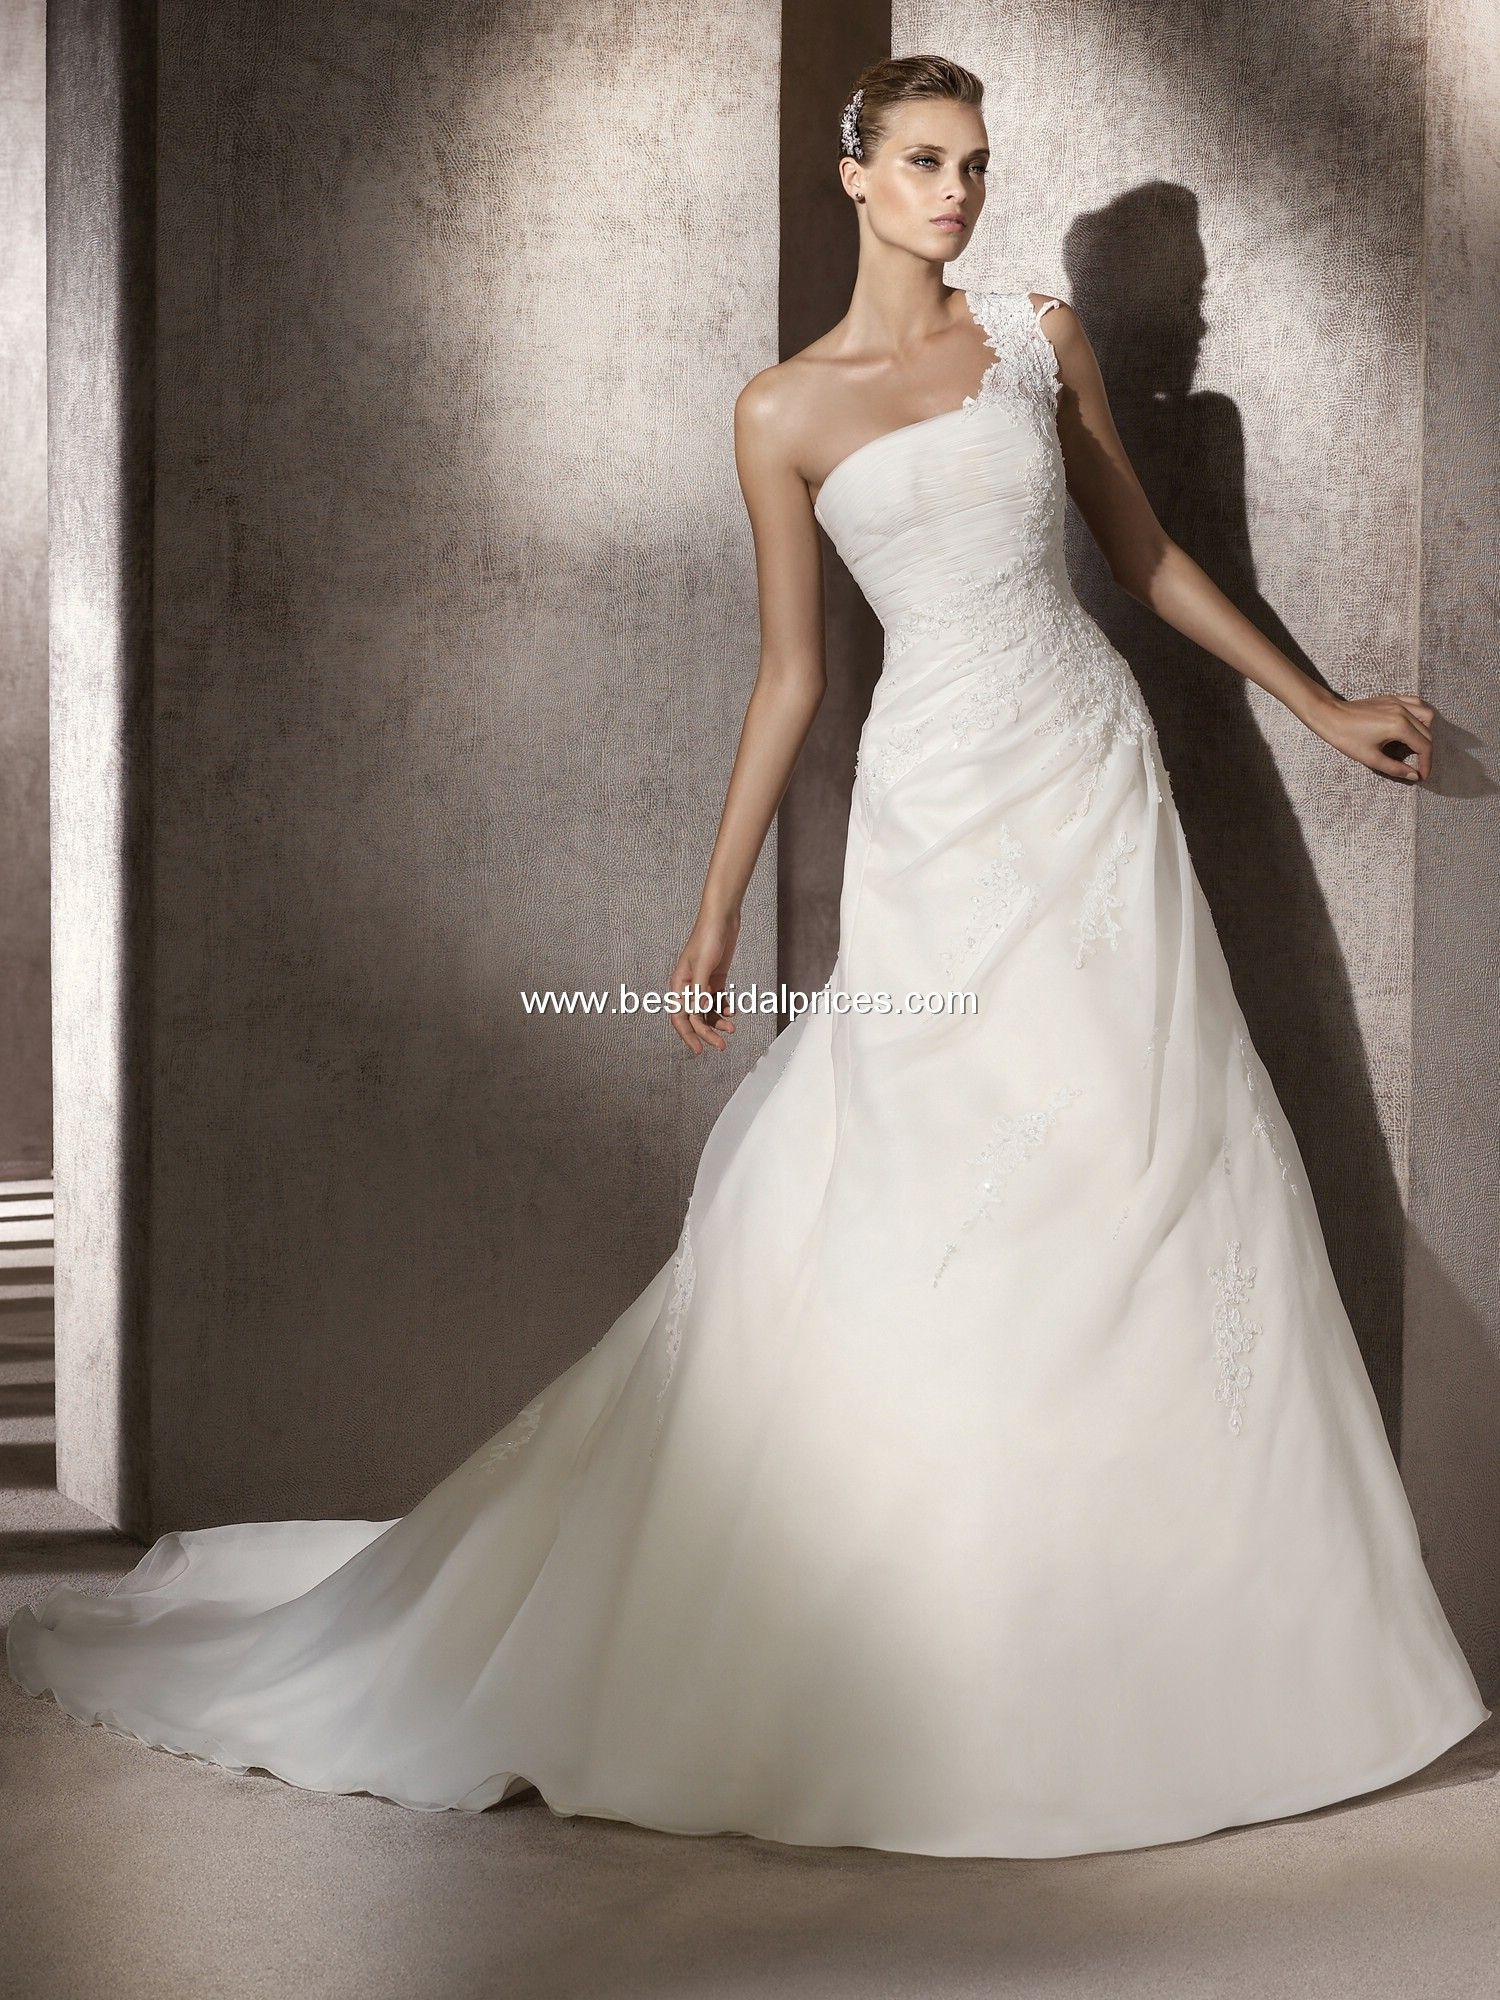 Pronovias Wedding Dresses - Style Albeniz   Wedding dresses ...